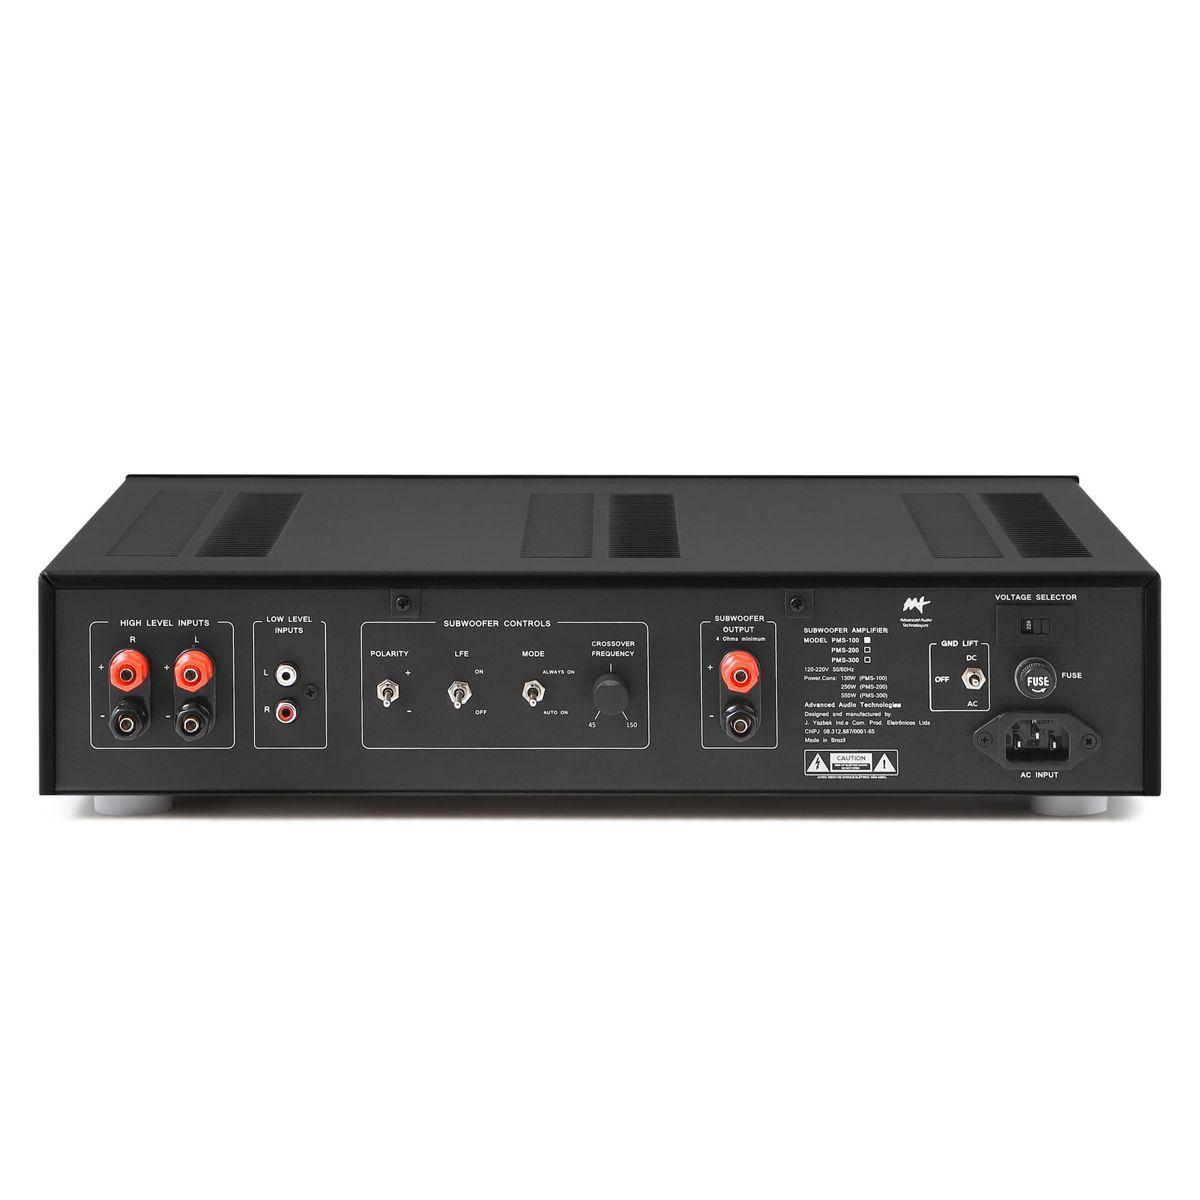 Amplificador Para Subwoofer Passivo 200W RMS / PMS-100 AAT